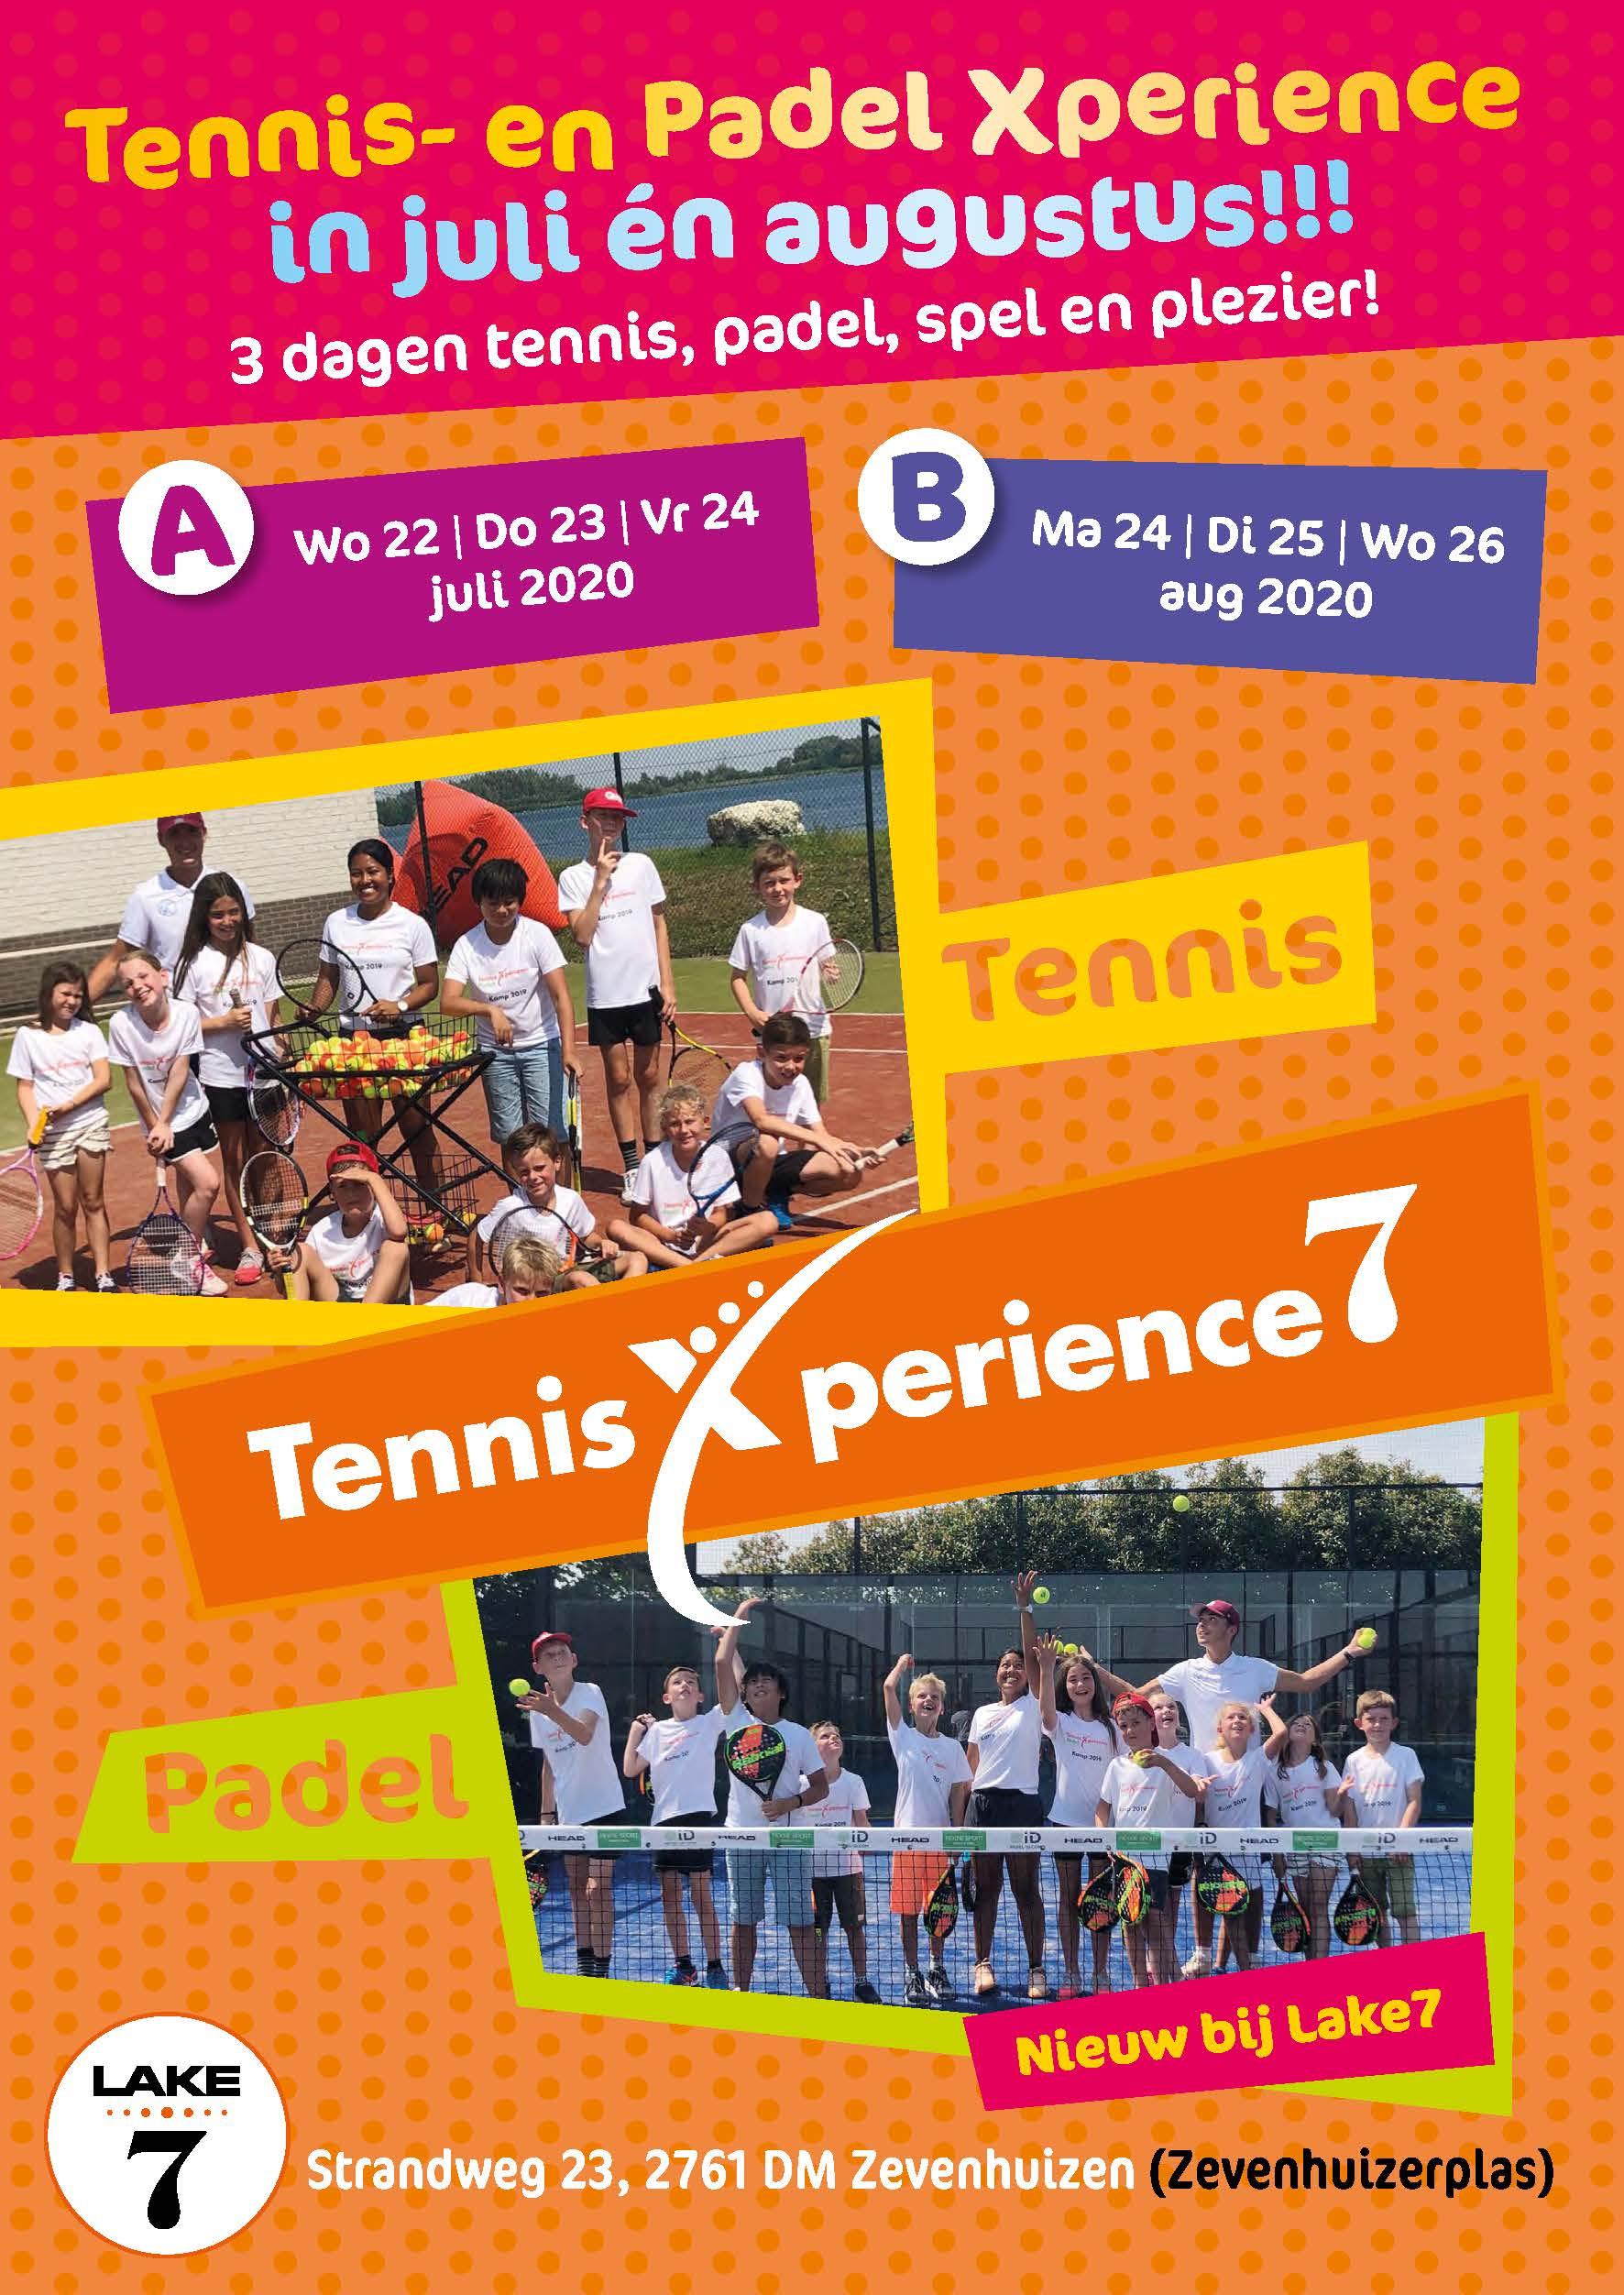 Flyer A5 Tennis-Padel kamp-2020-A